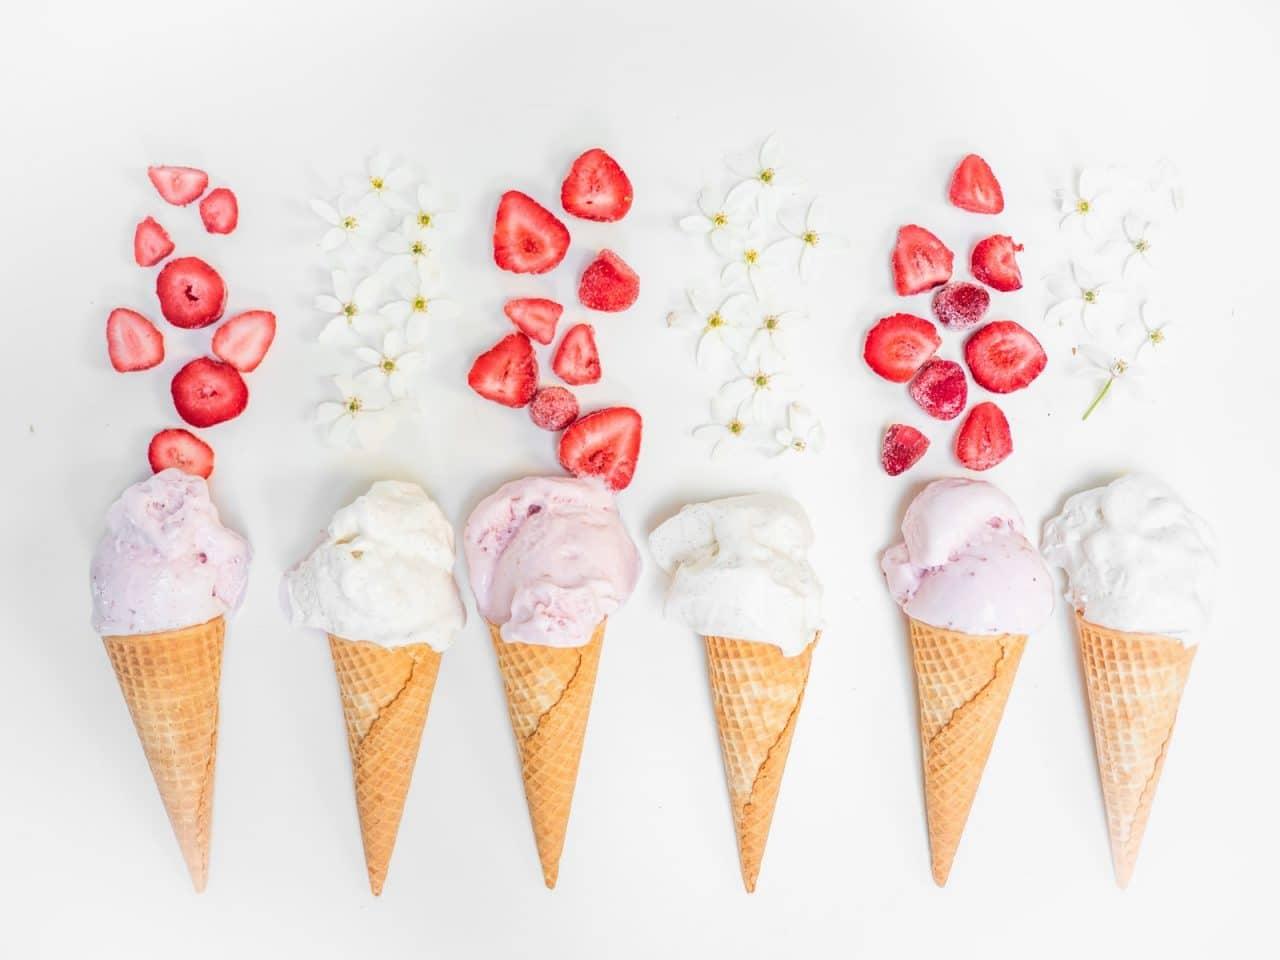 ice cream with strawberry on cone